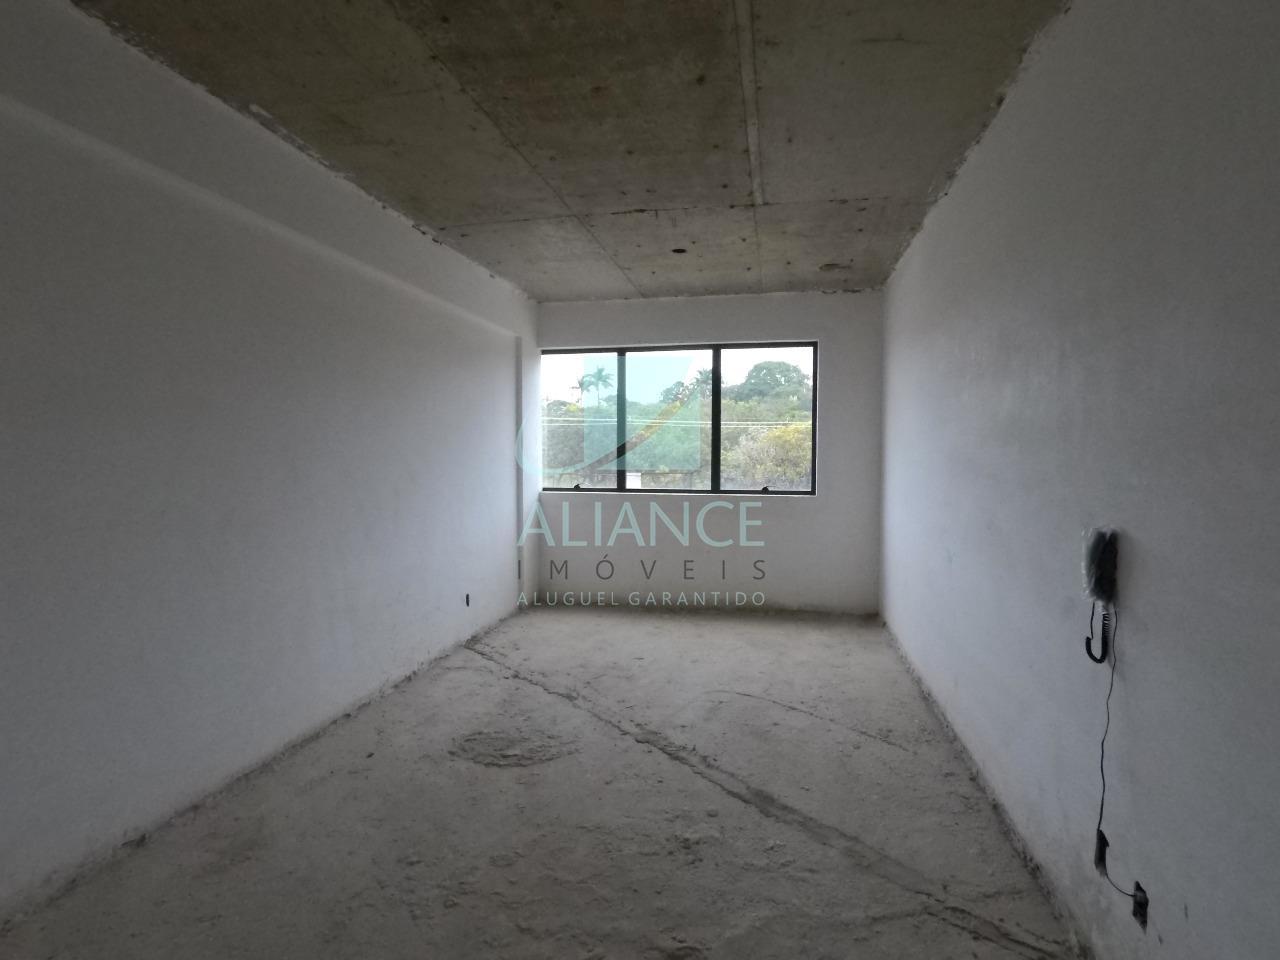 Salas para aluguel no Joana D arc: